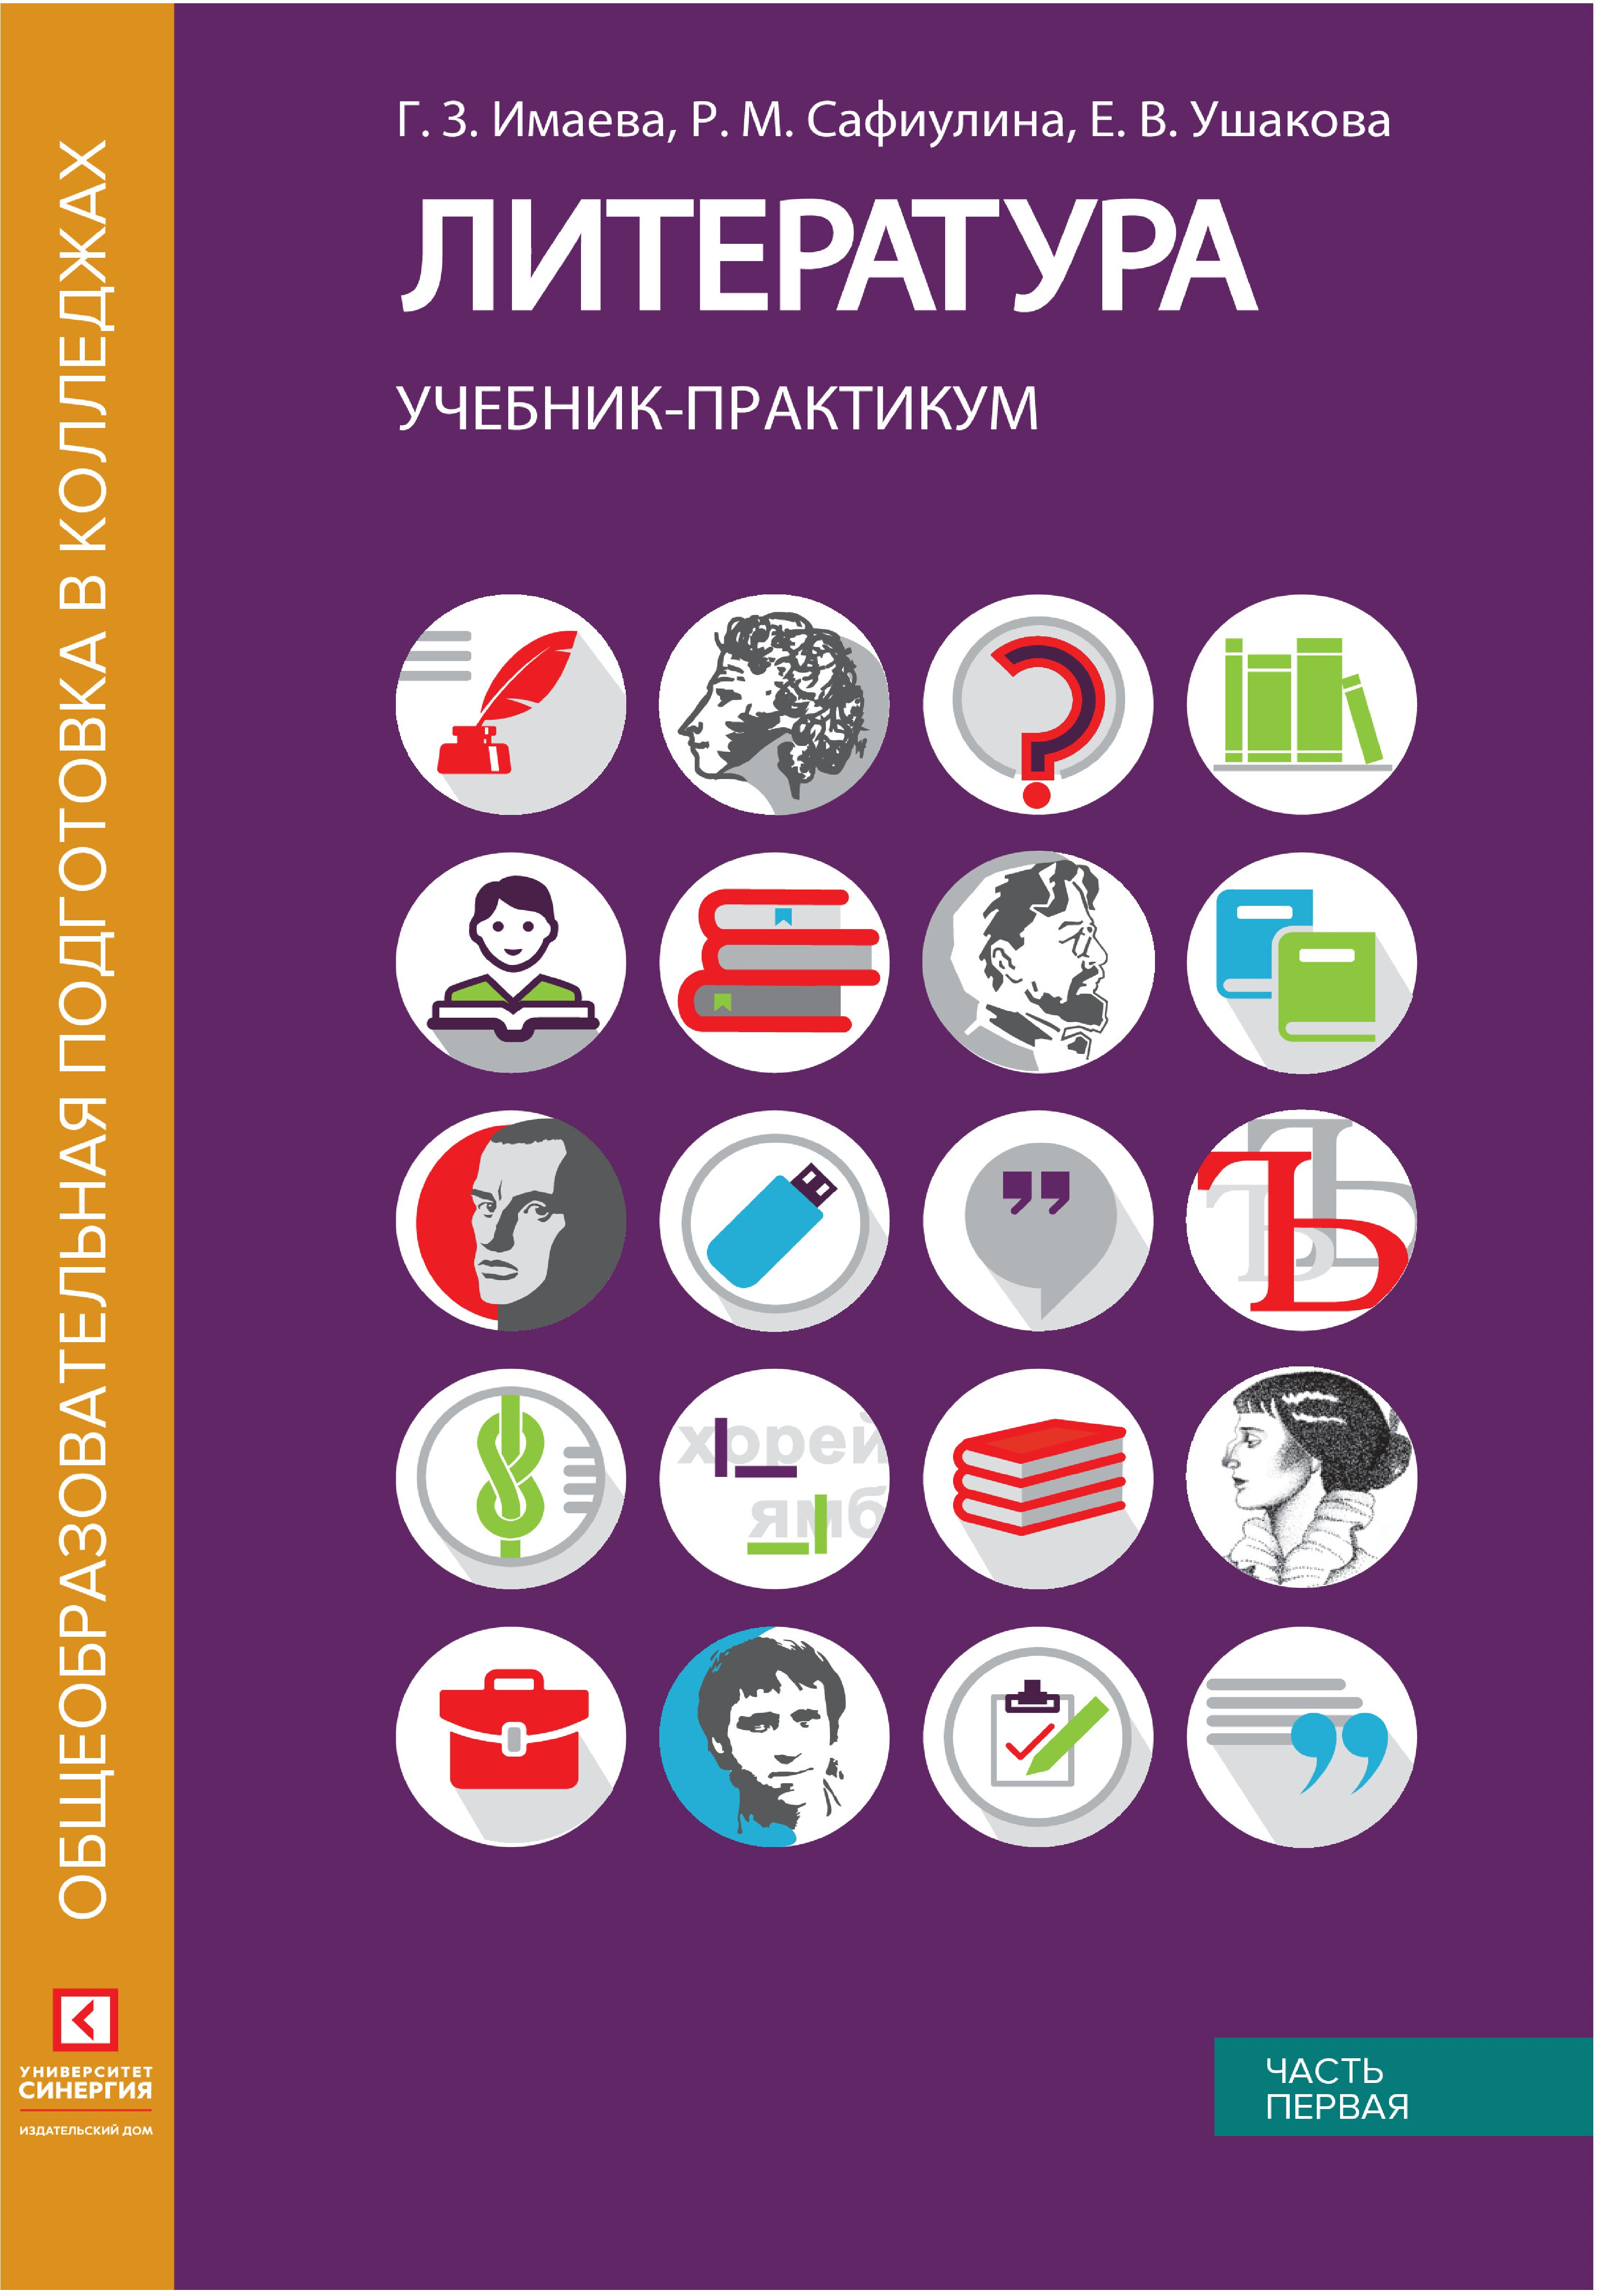 Литература: учебник-практикум в 2 ч. Ч. 1: Литература XIX века . ISBN 978-5-4257-0487-0